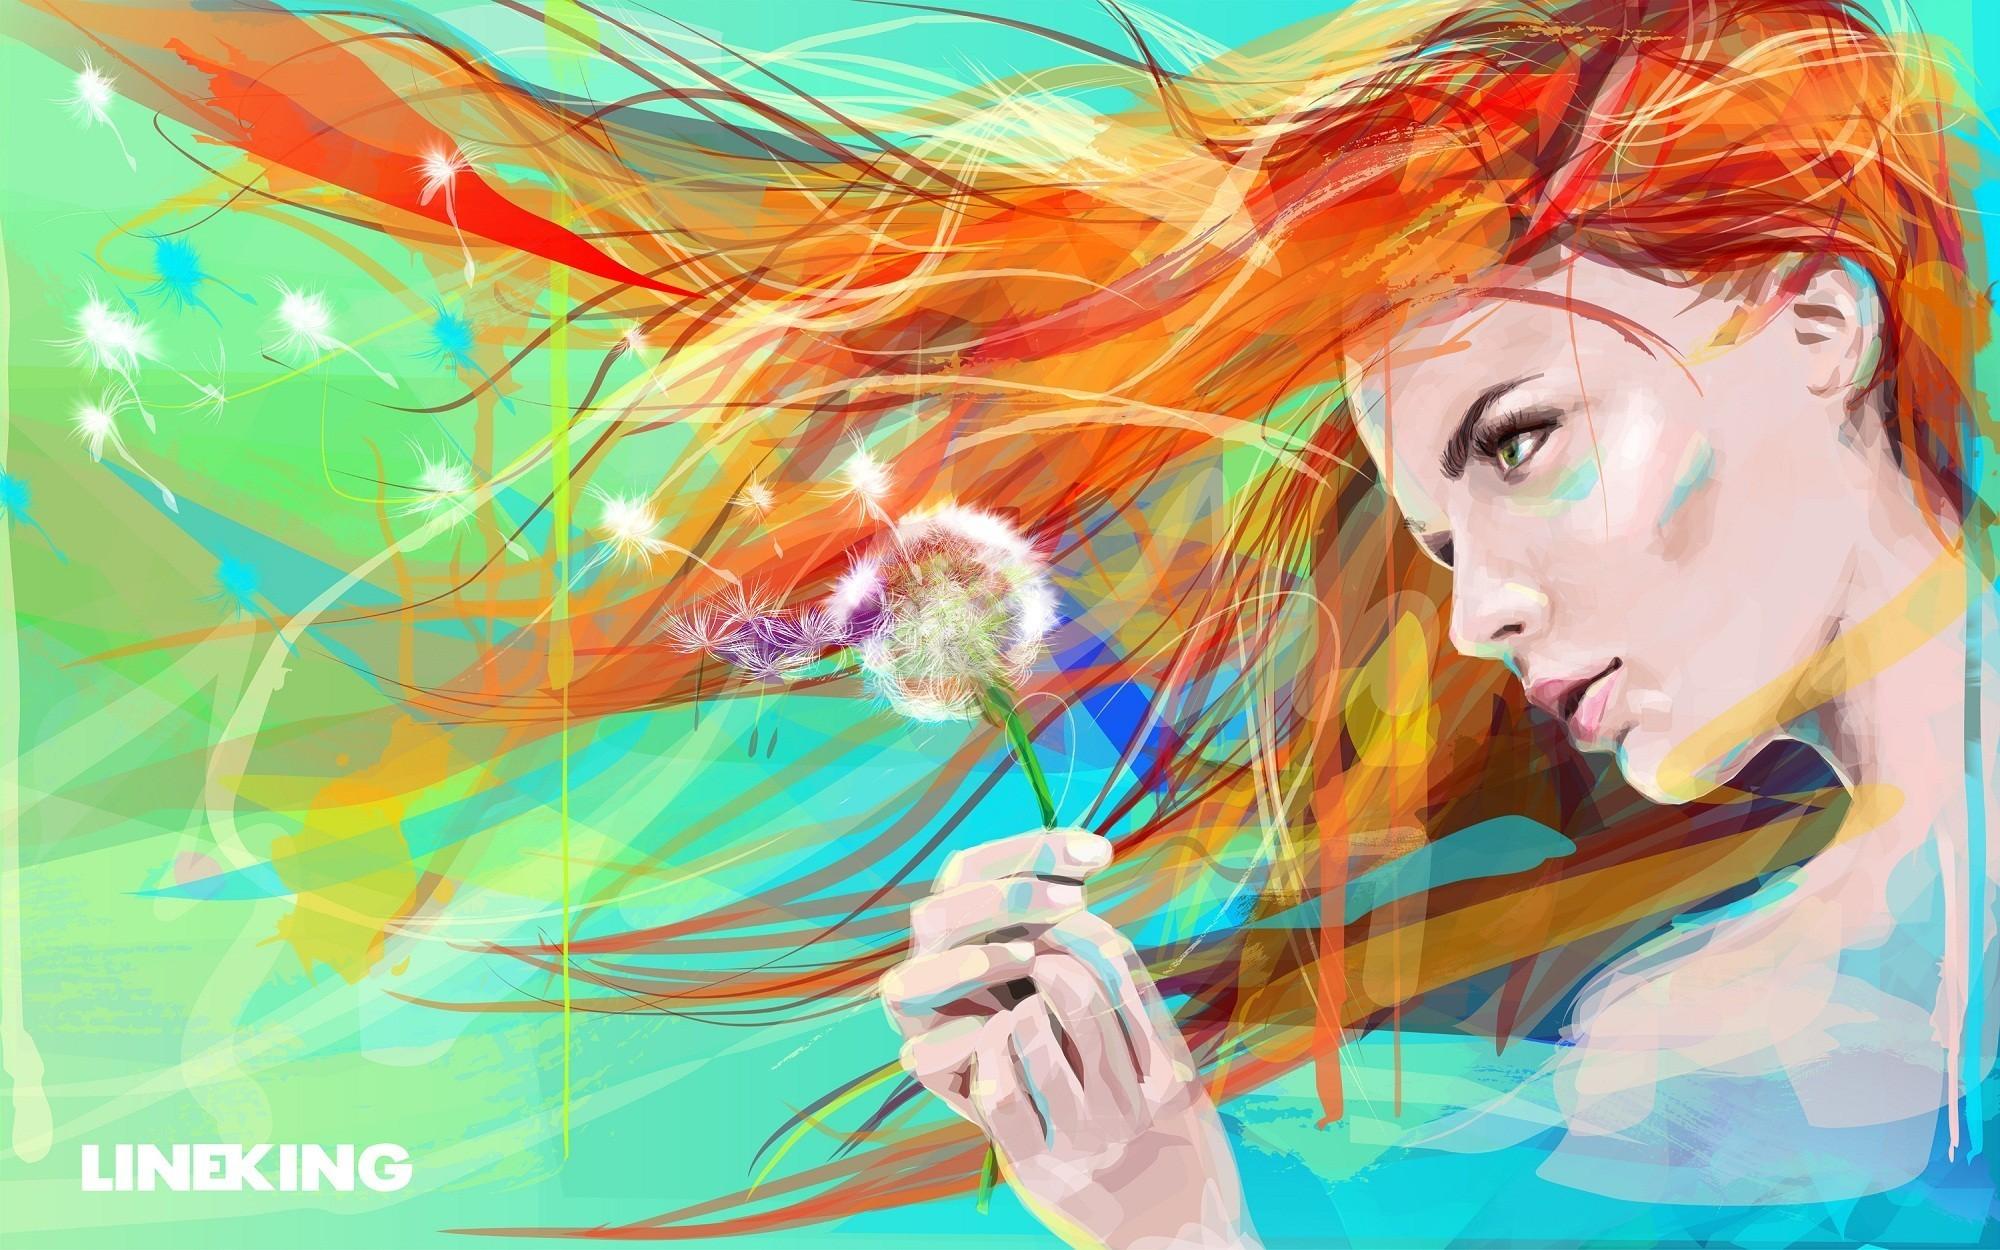 Wallpaper : Face, Drawing, Illustration, Women, Redhead